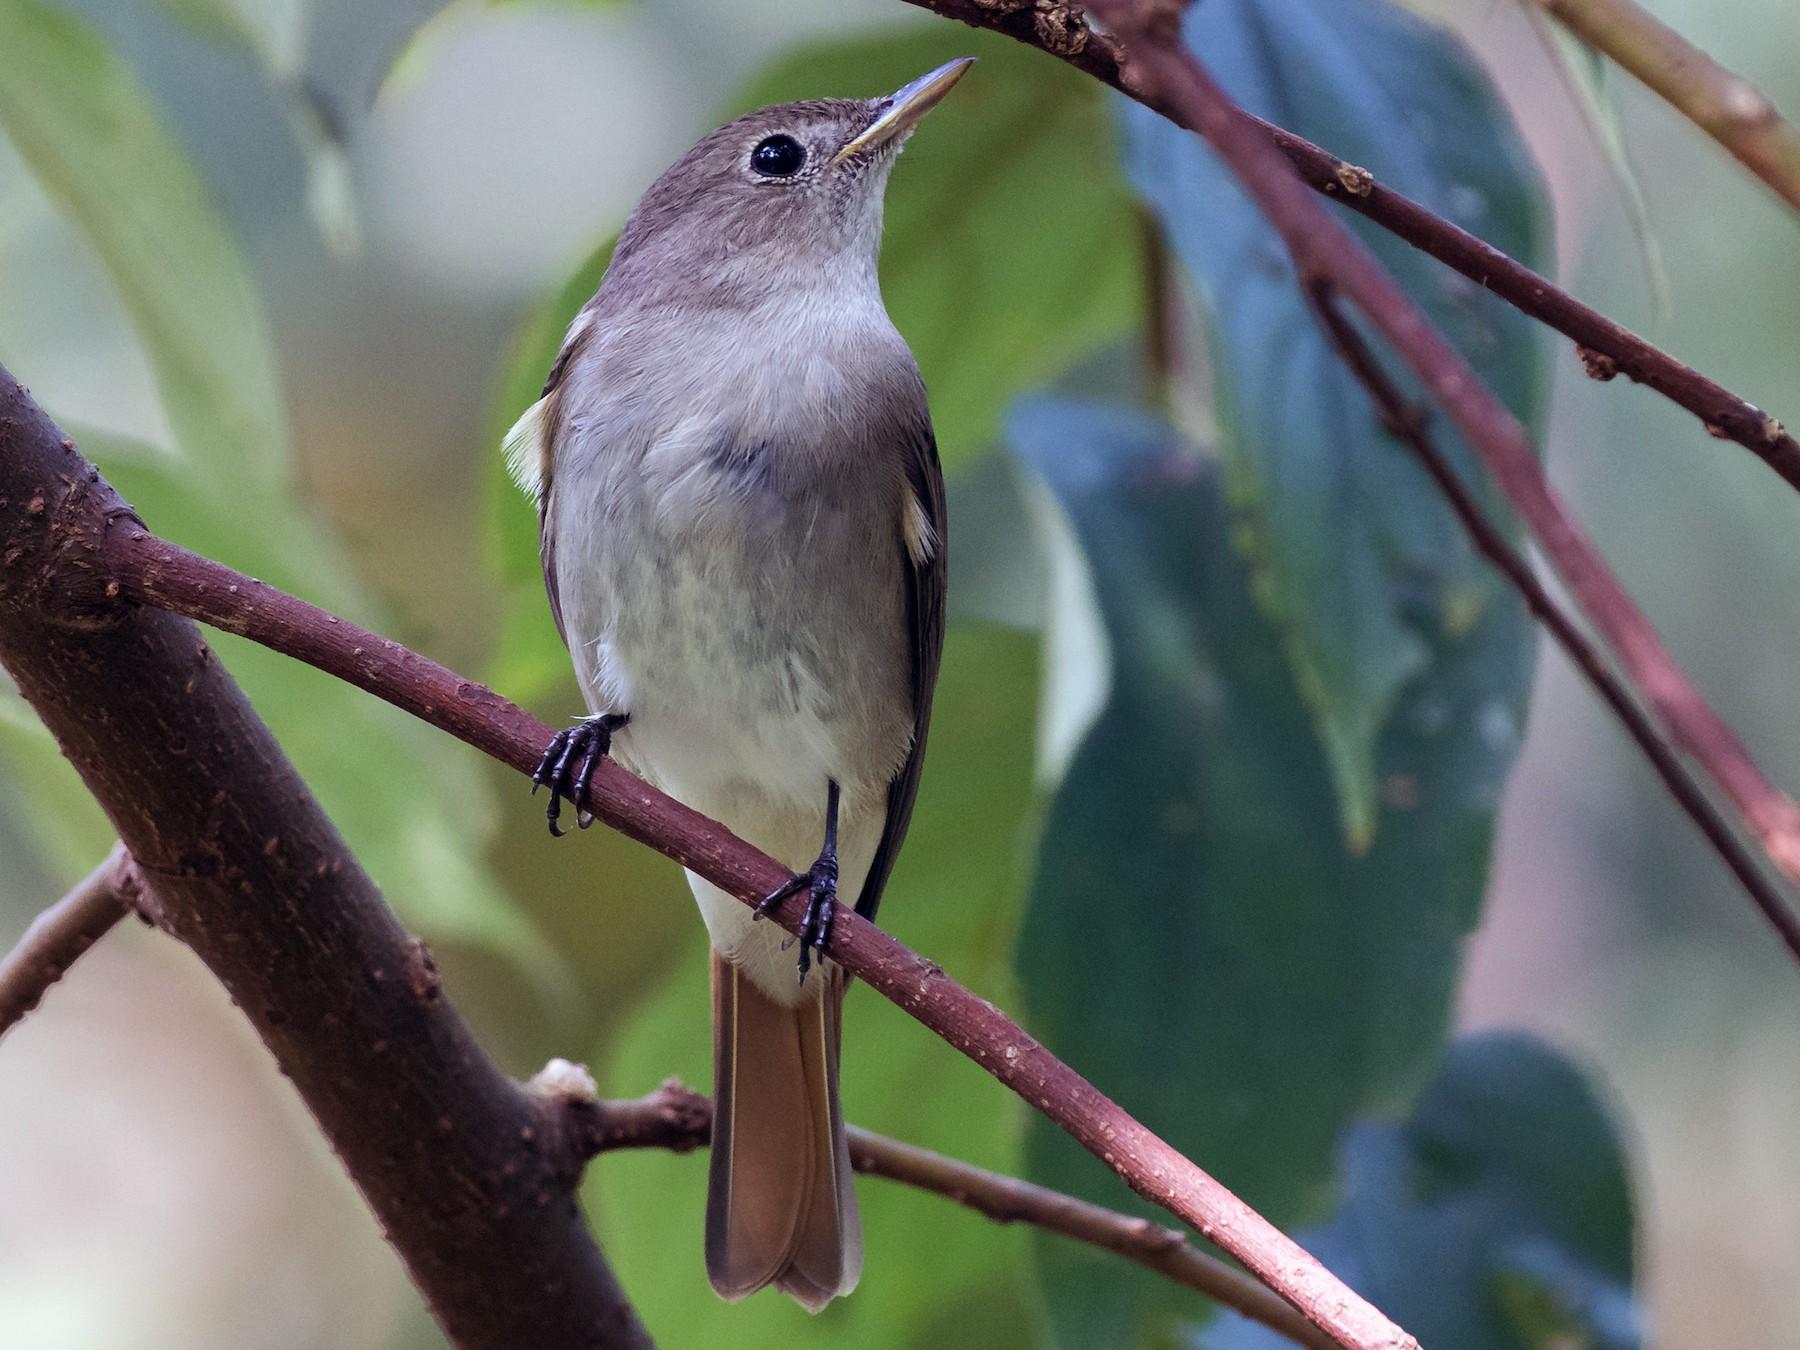 Rusty-tailed Flycatcher - Sidharth Srinivasan